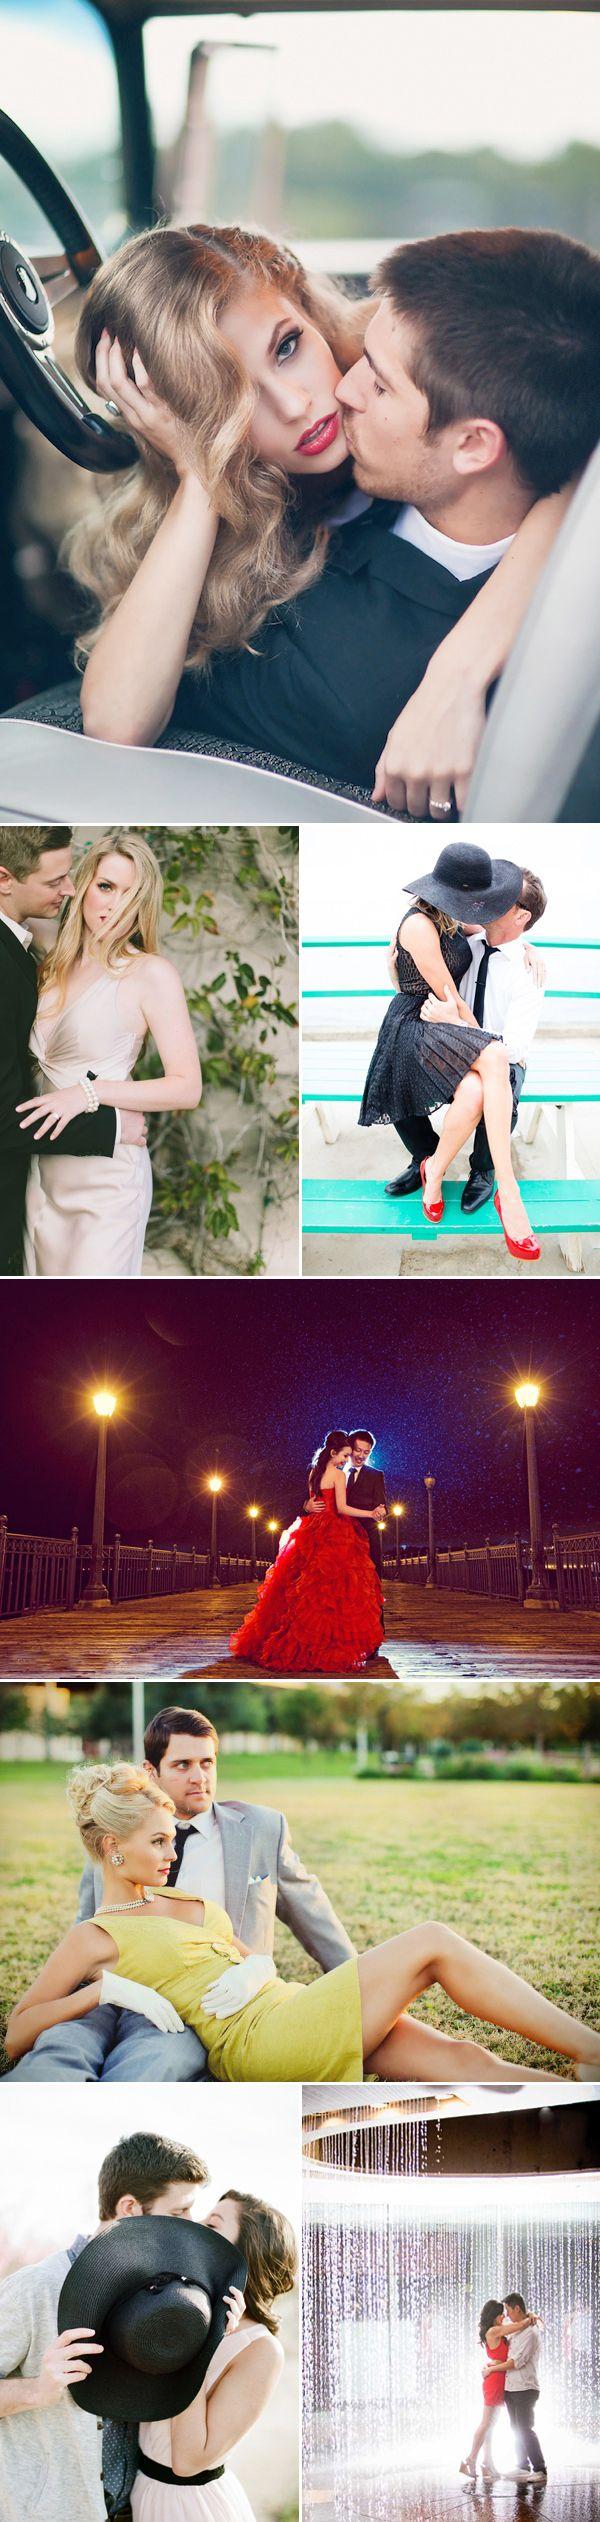 22 High Fashion Engagement Photos - Sexy & Glamorous